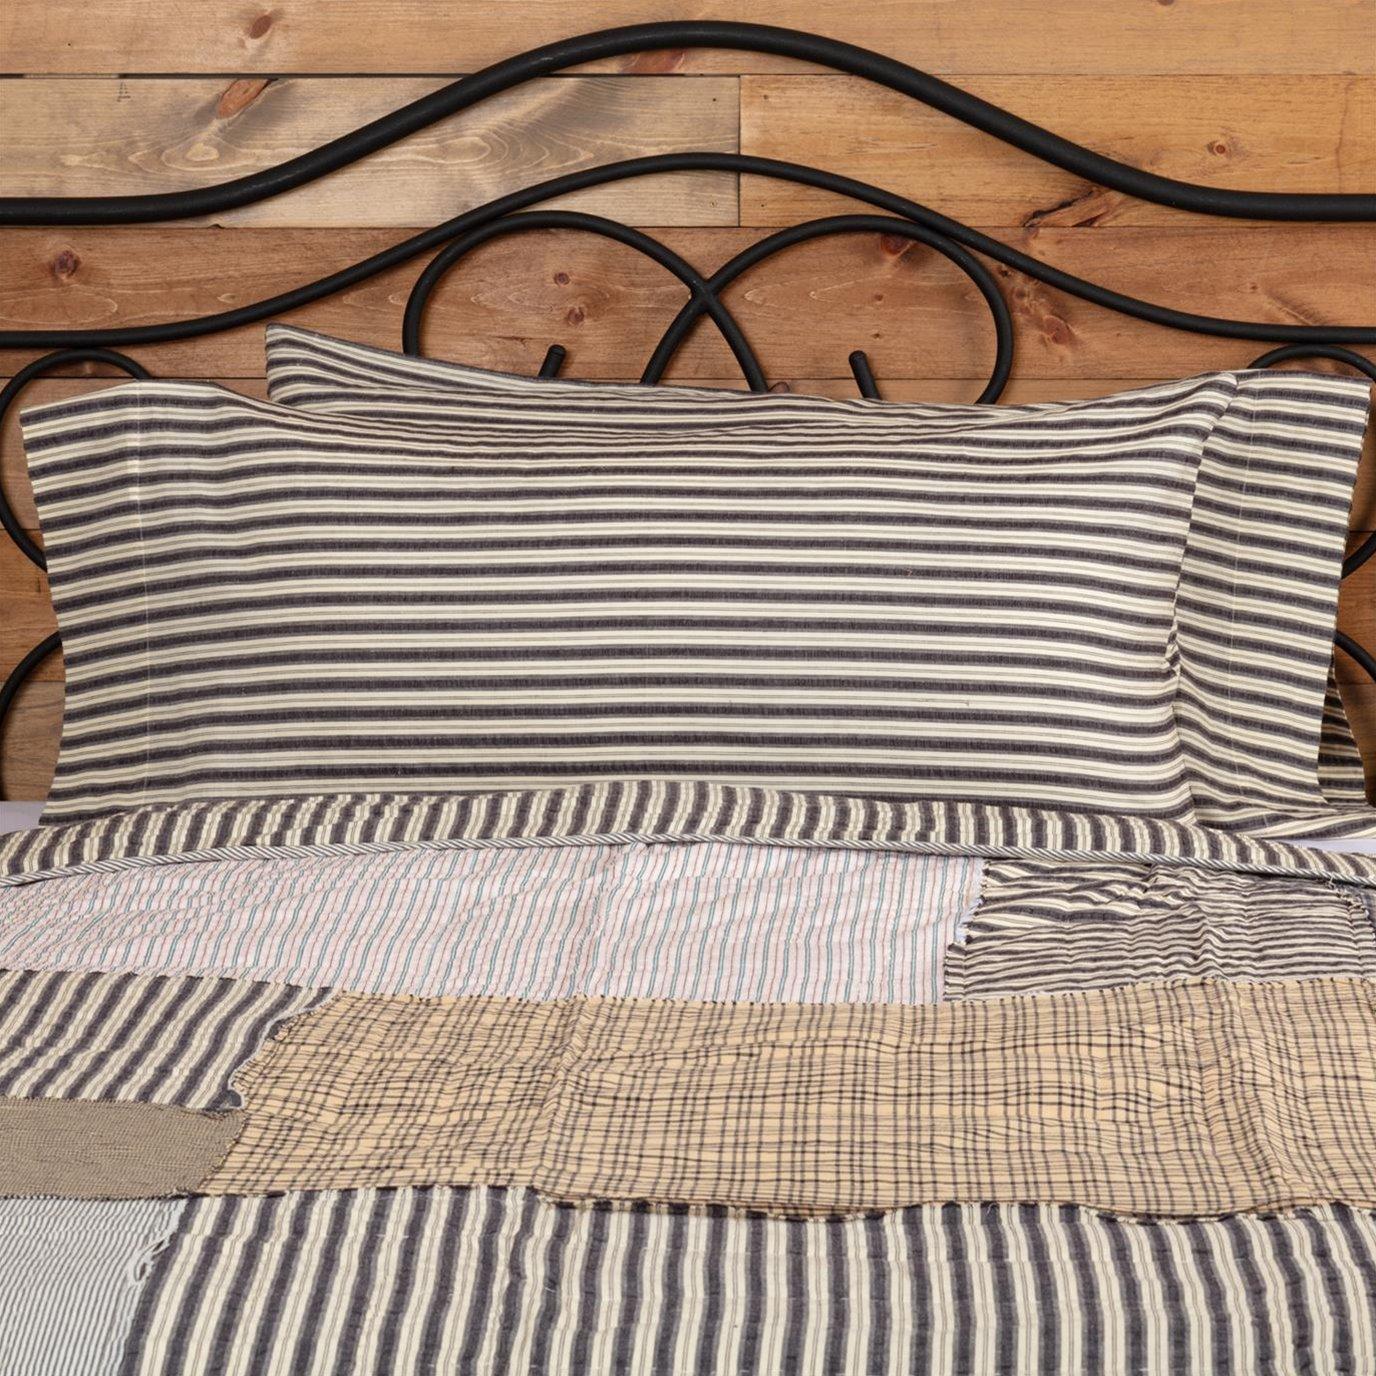 Ashmont Ticking Stripe King Pillow Case Set of 2 21x40